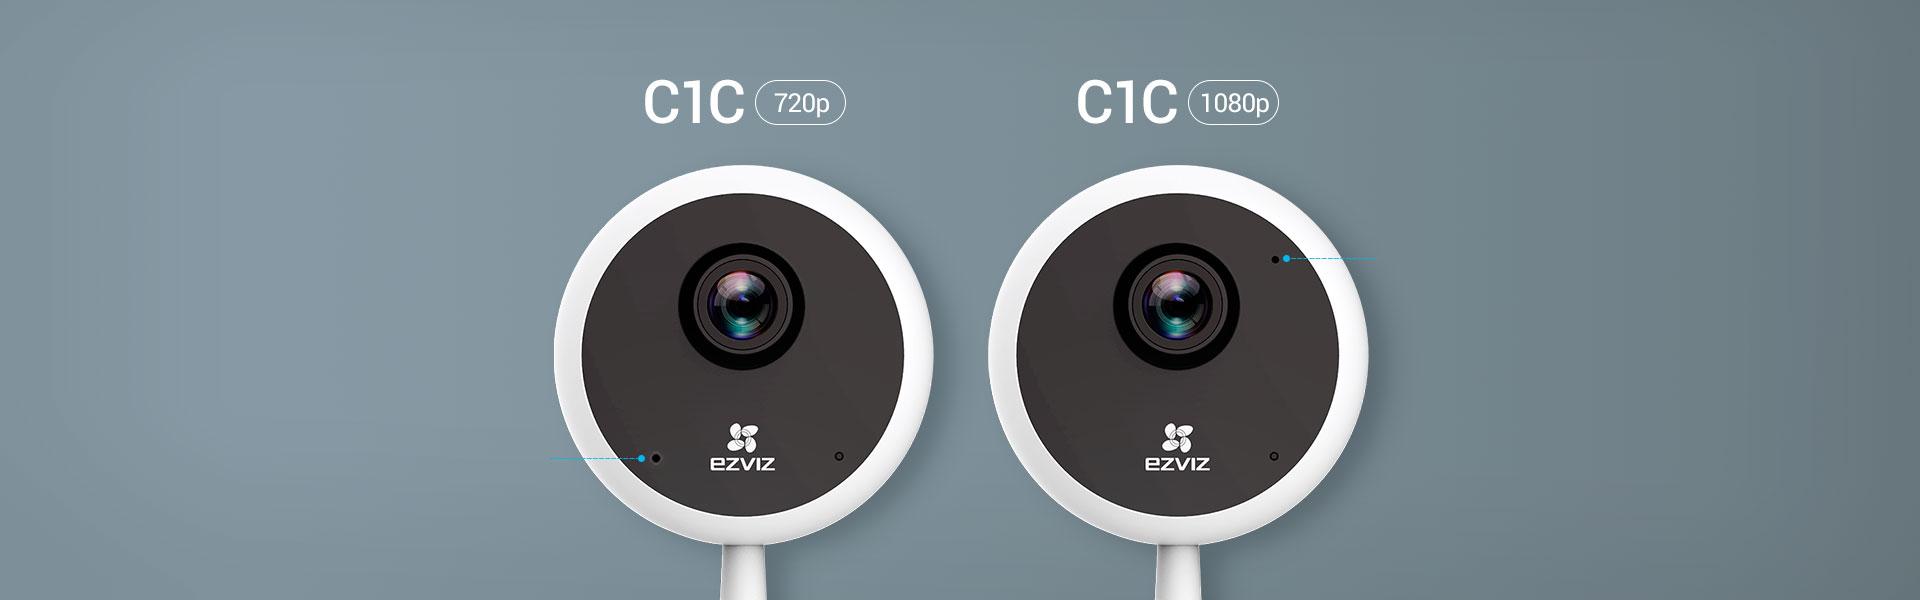 1MP C1C Indoor Wi-Fi Camera CS-C1C-D0-1D1WFR